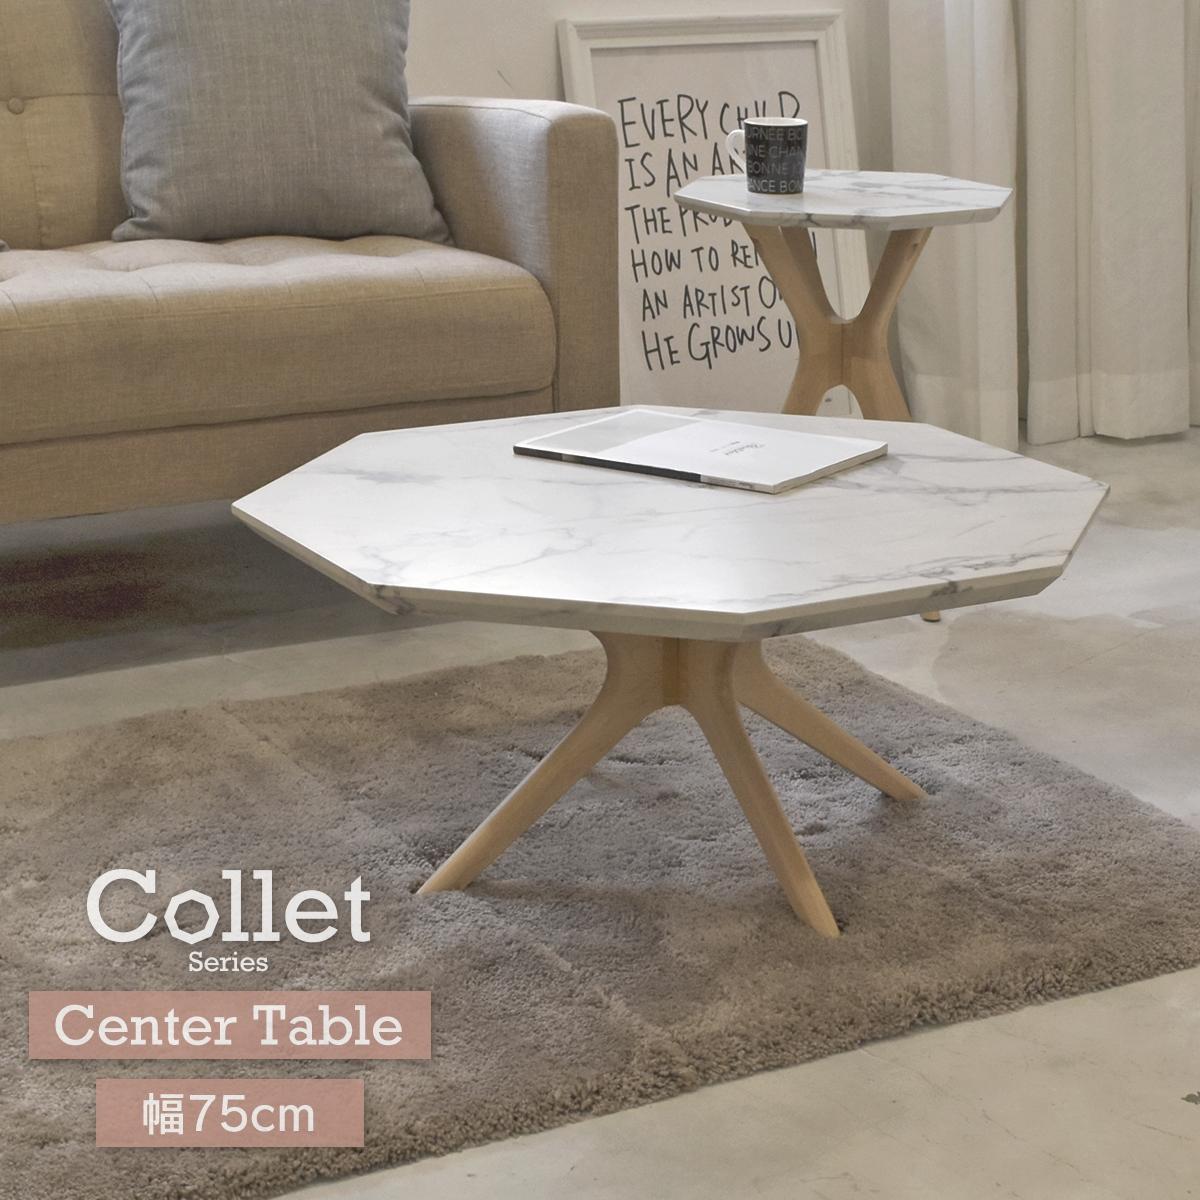 Collet センターテーブル 幅75 【送料無料 SALE】 コレット table 家具 机 食卓 木製 天然木 バーチ 大理石柄 W750×D750×H350mm COCT-75